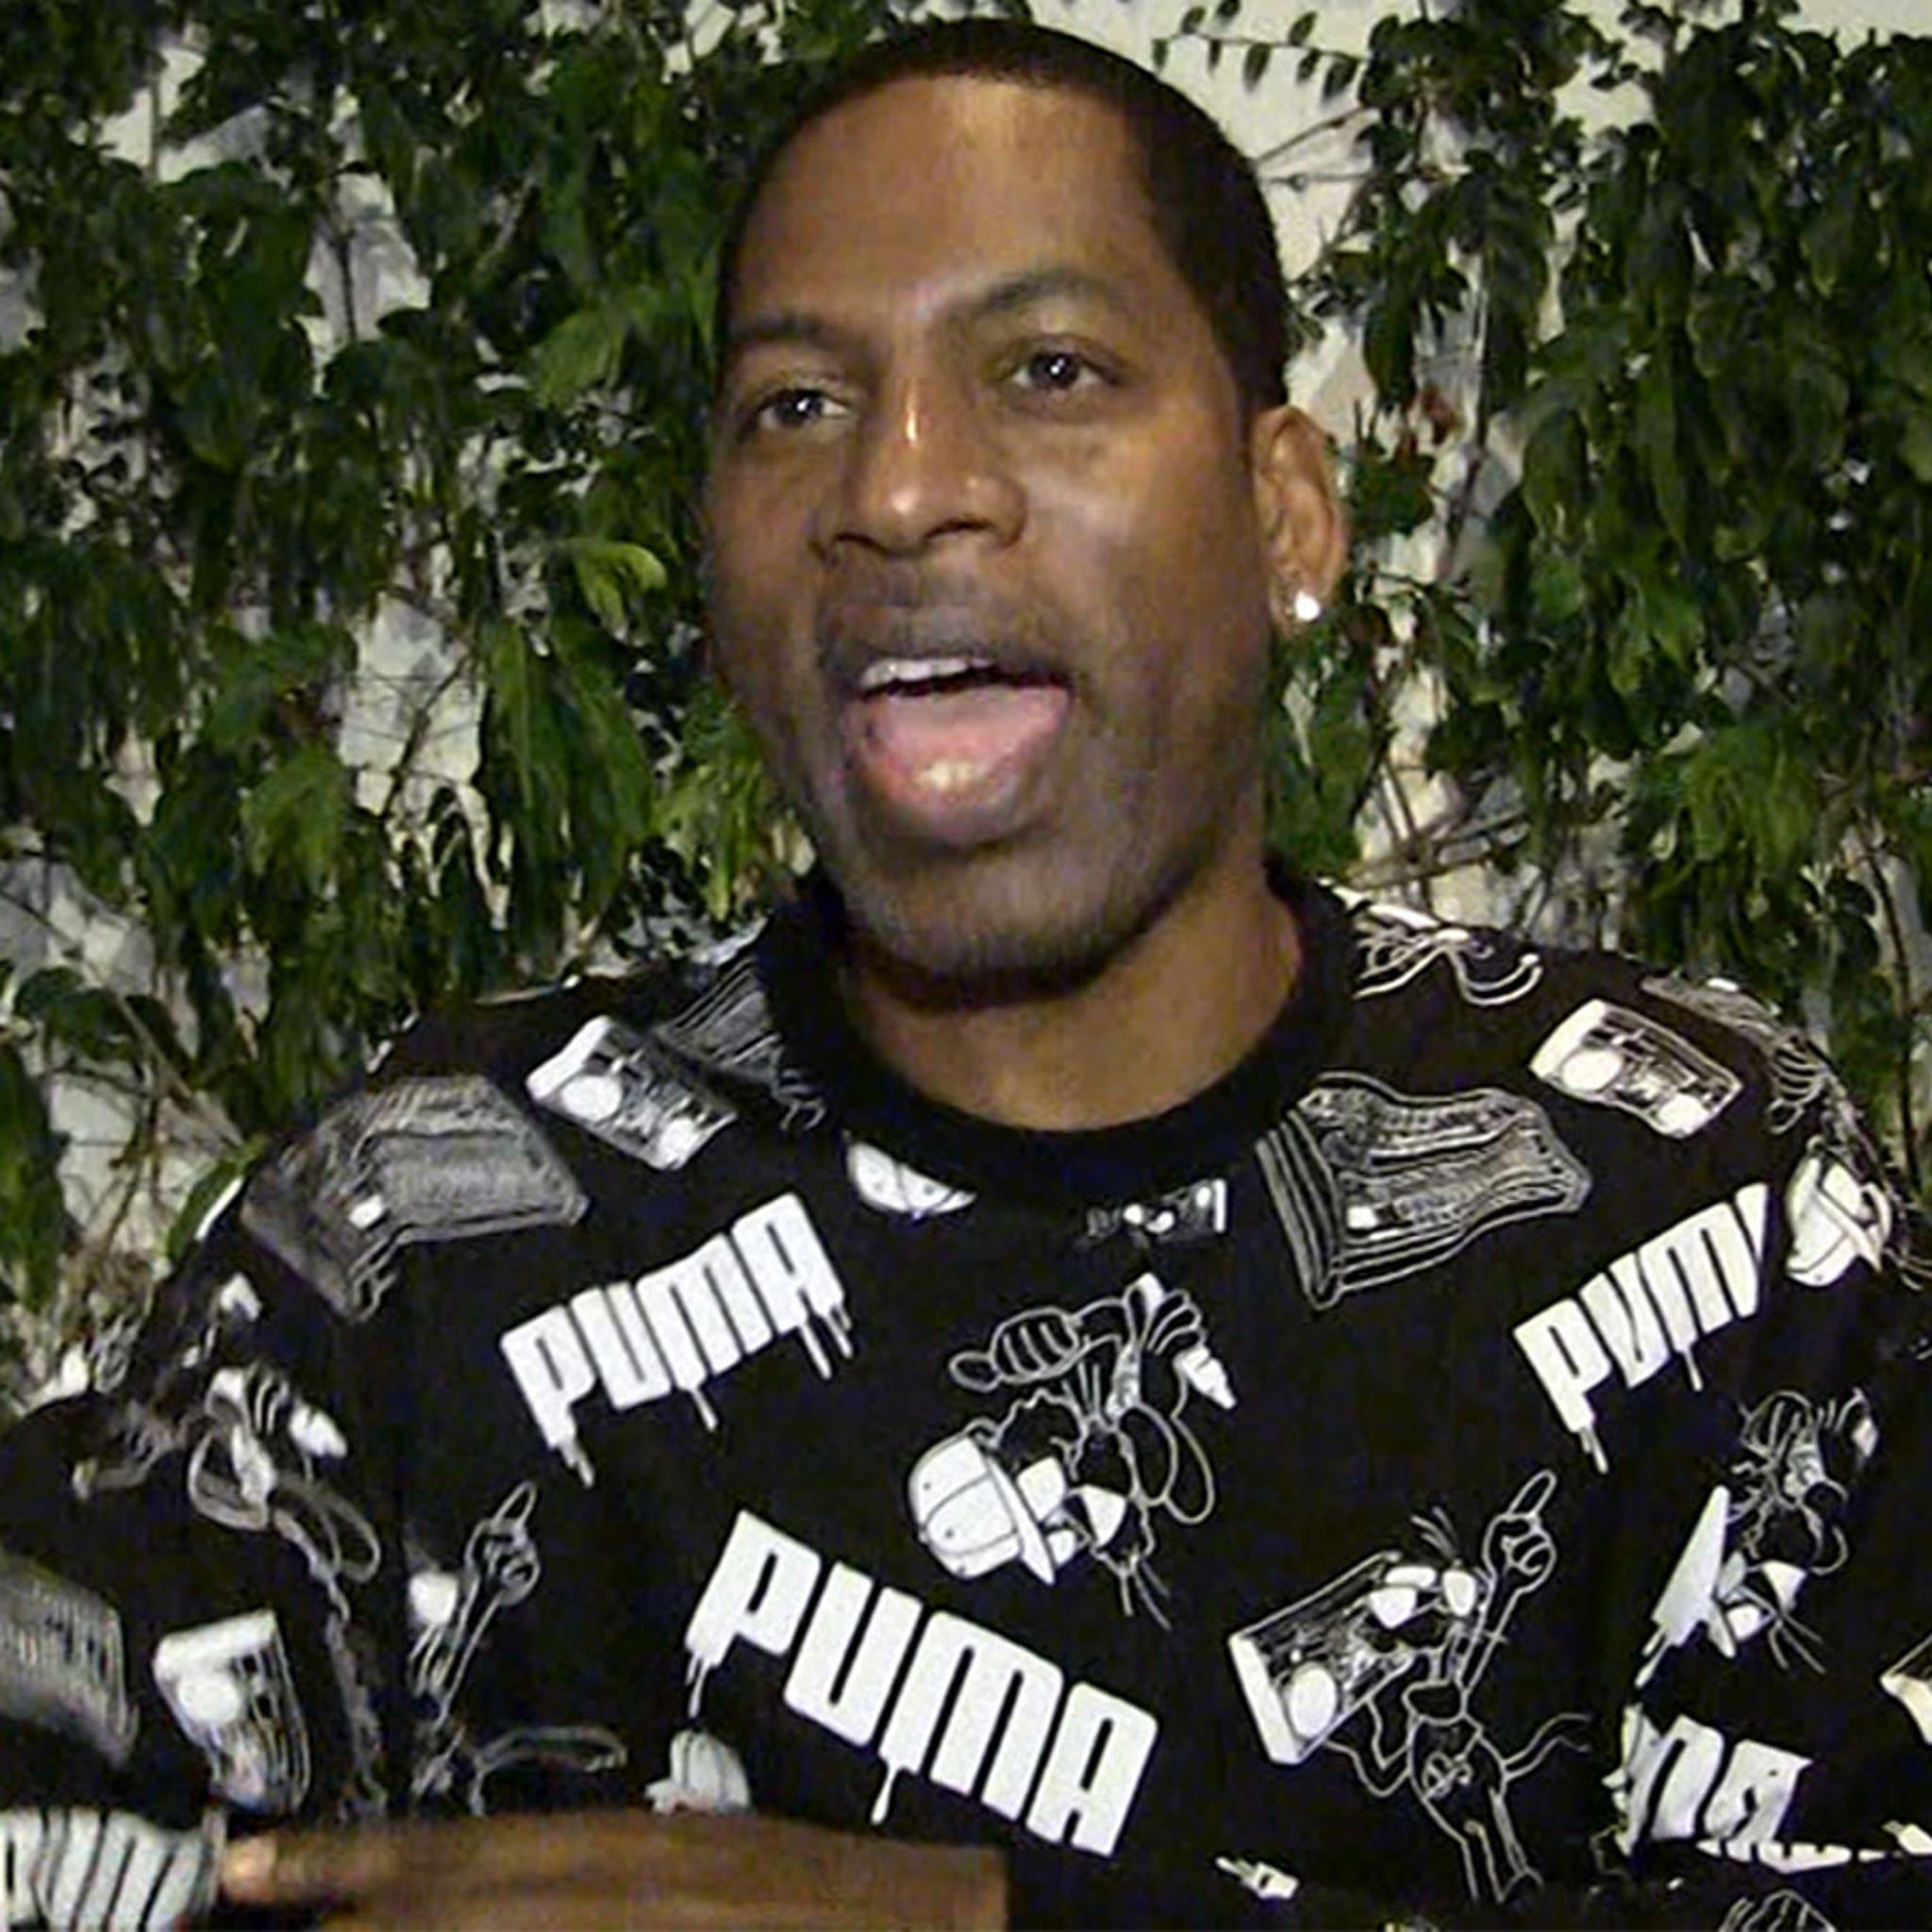 Tony Rock Says Jay-Z Won't Help Kaepernick Get NFL Job, 'He Don't Care!'